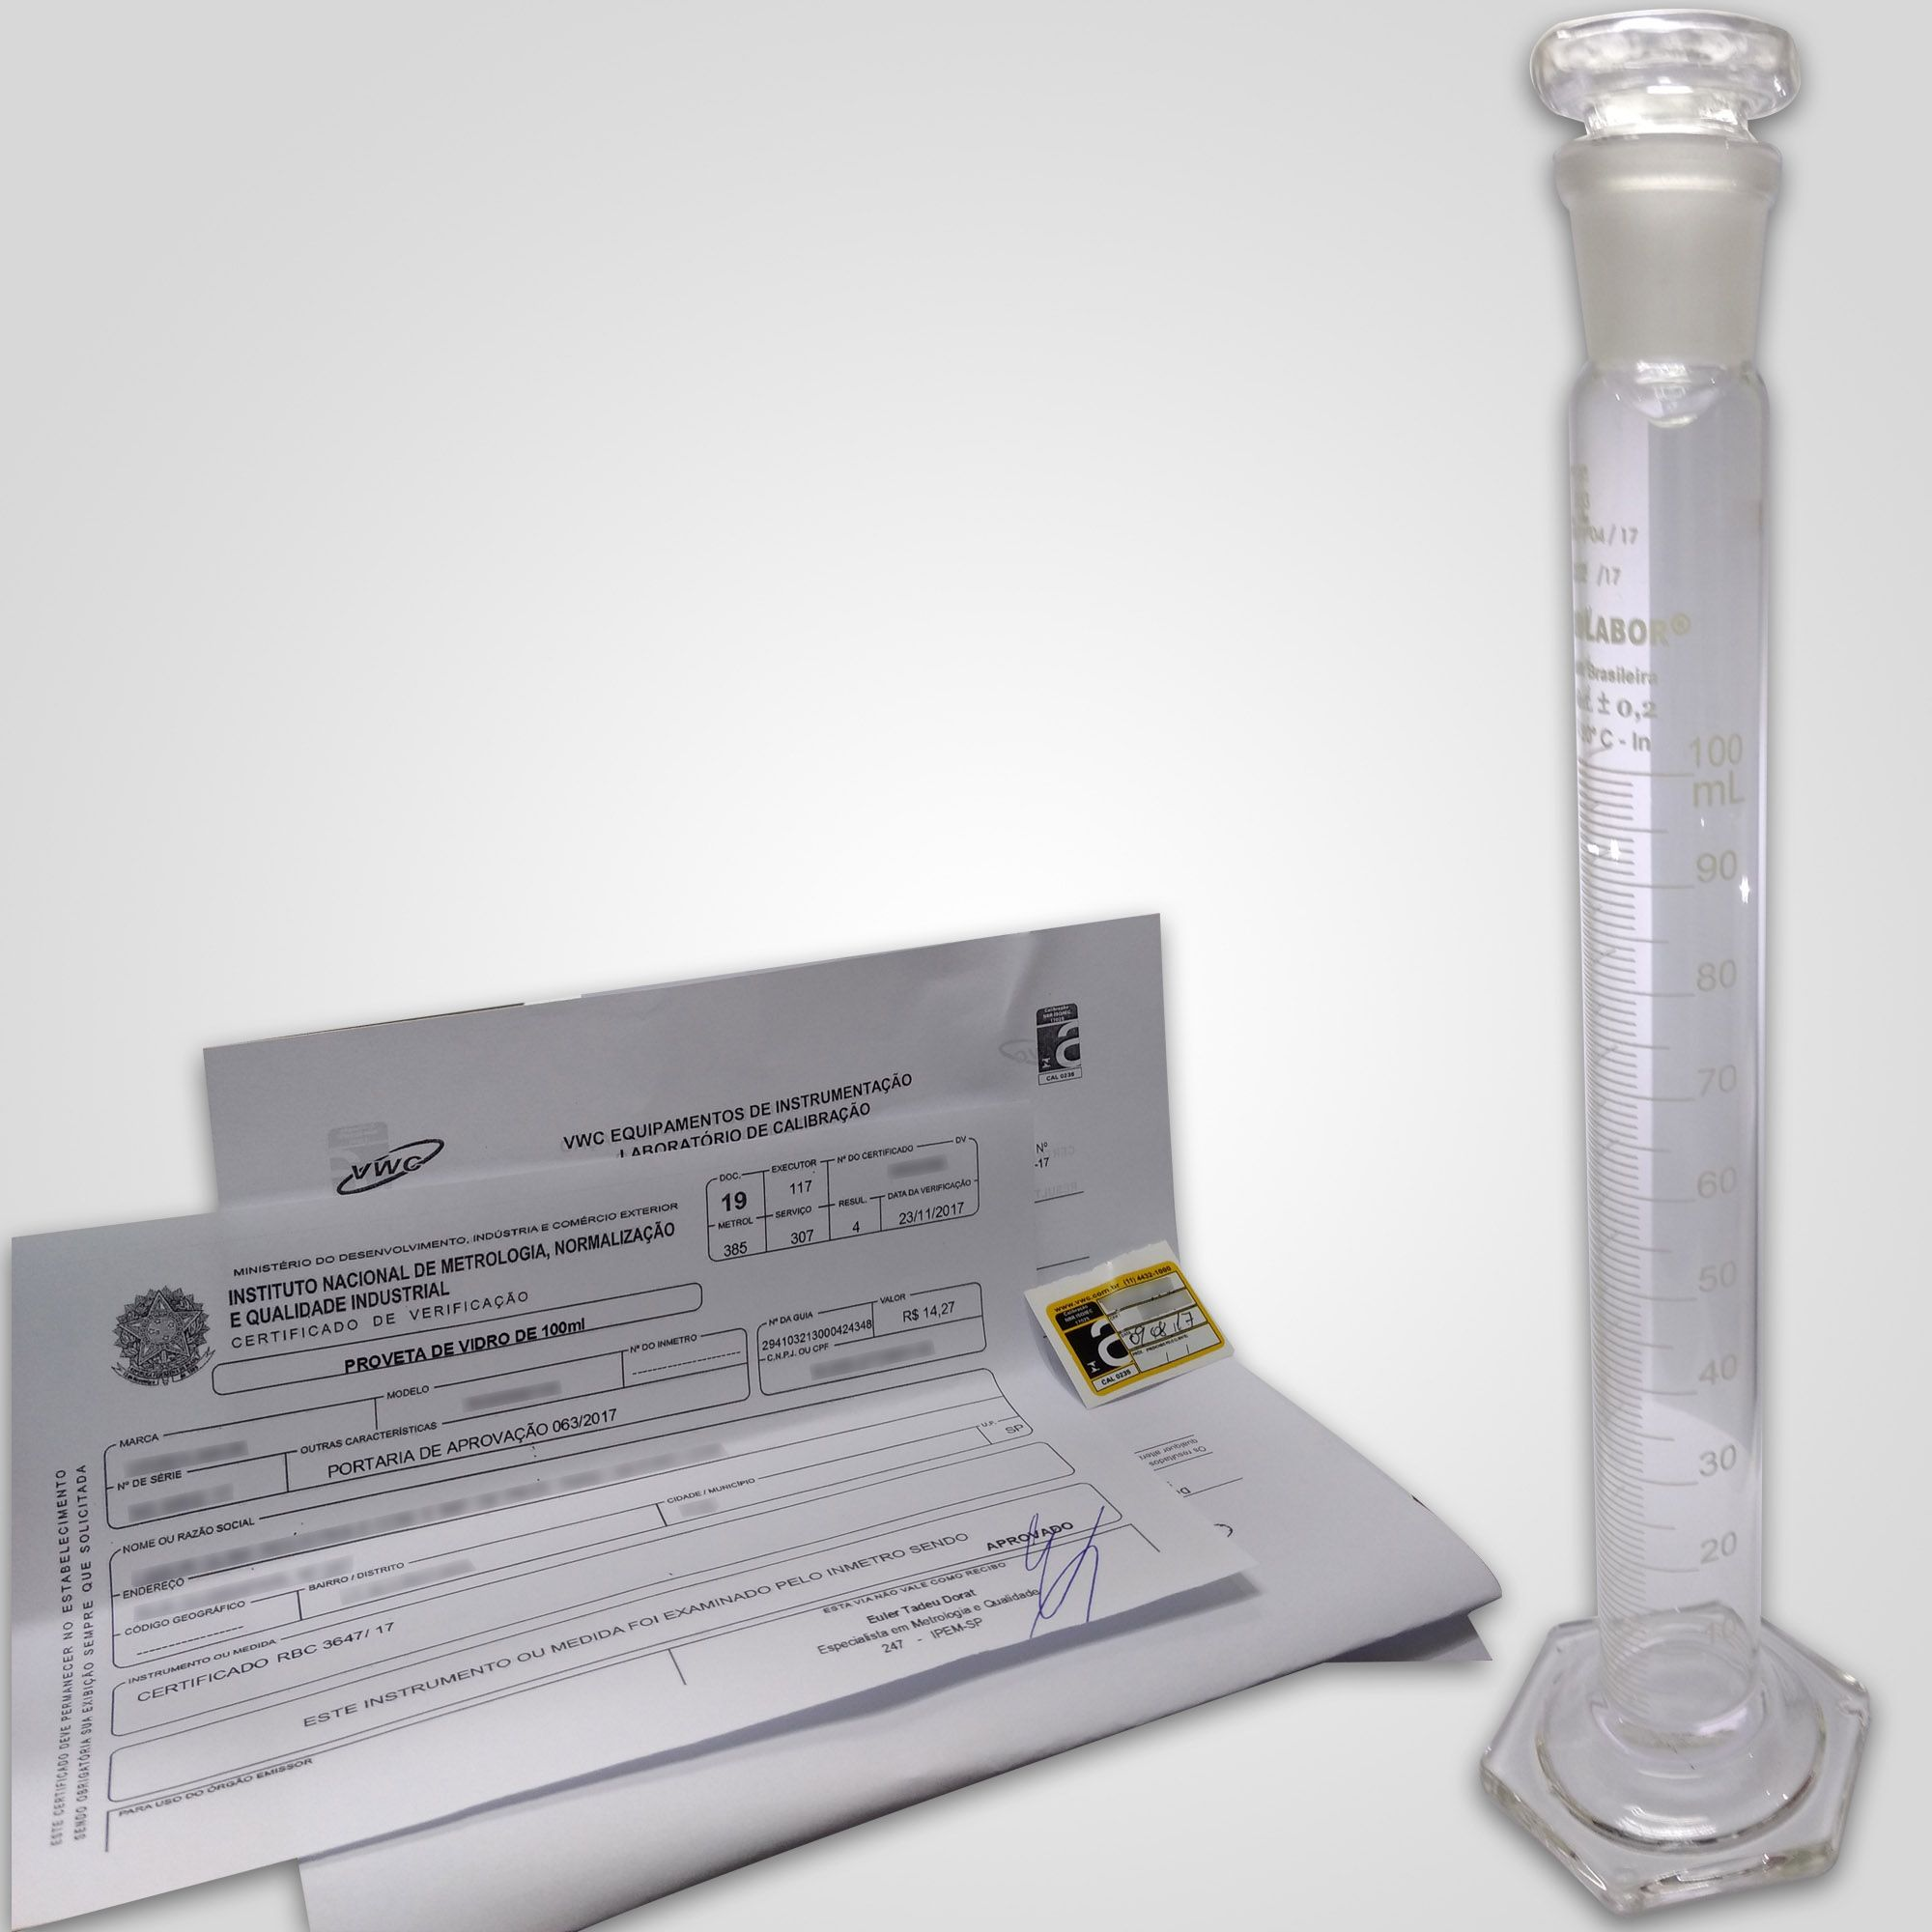 Proveta de 100 mL - Certificada pelo INMETRO (Portaria 528)